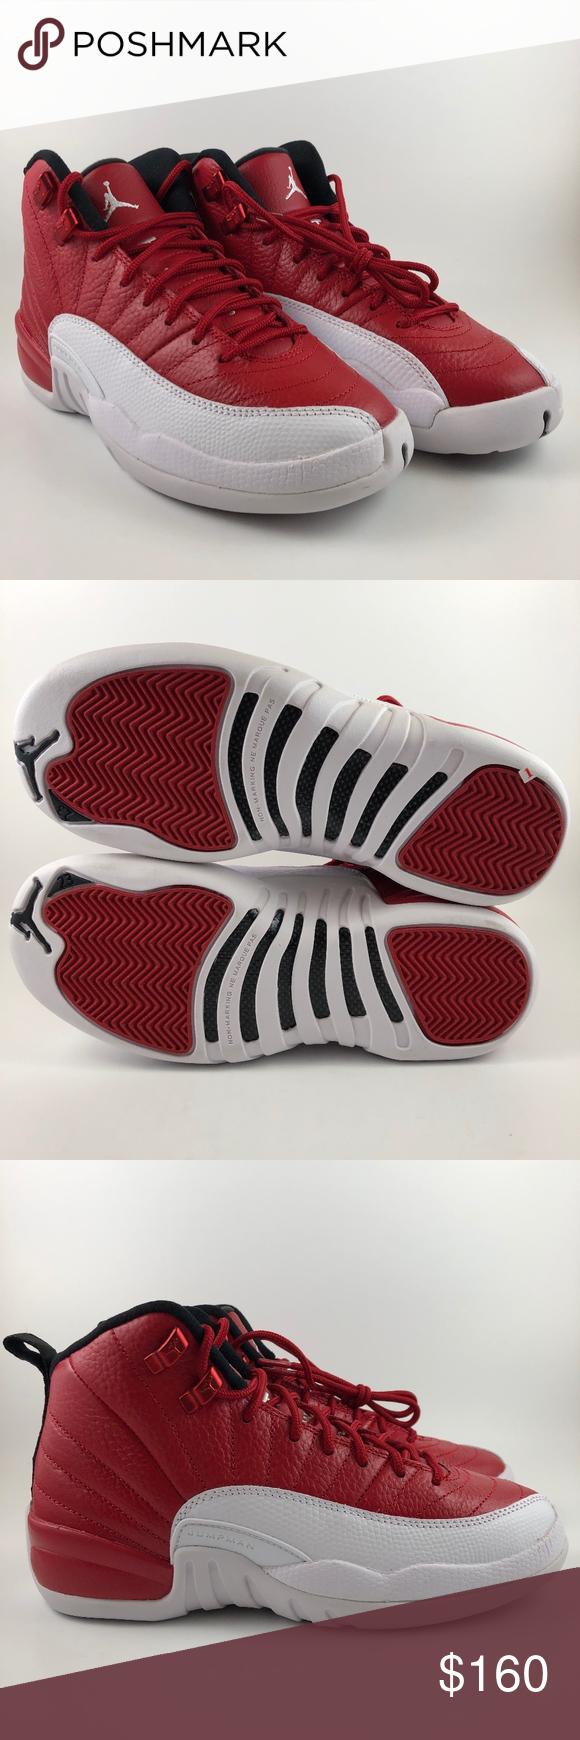 reputable site 1fa72 50947 Jordan Retro 12 Gym red - White - Black Womens Siz Brand New ...